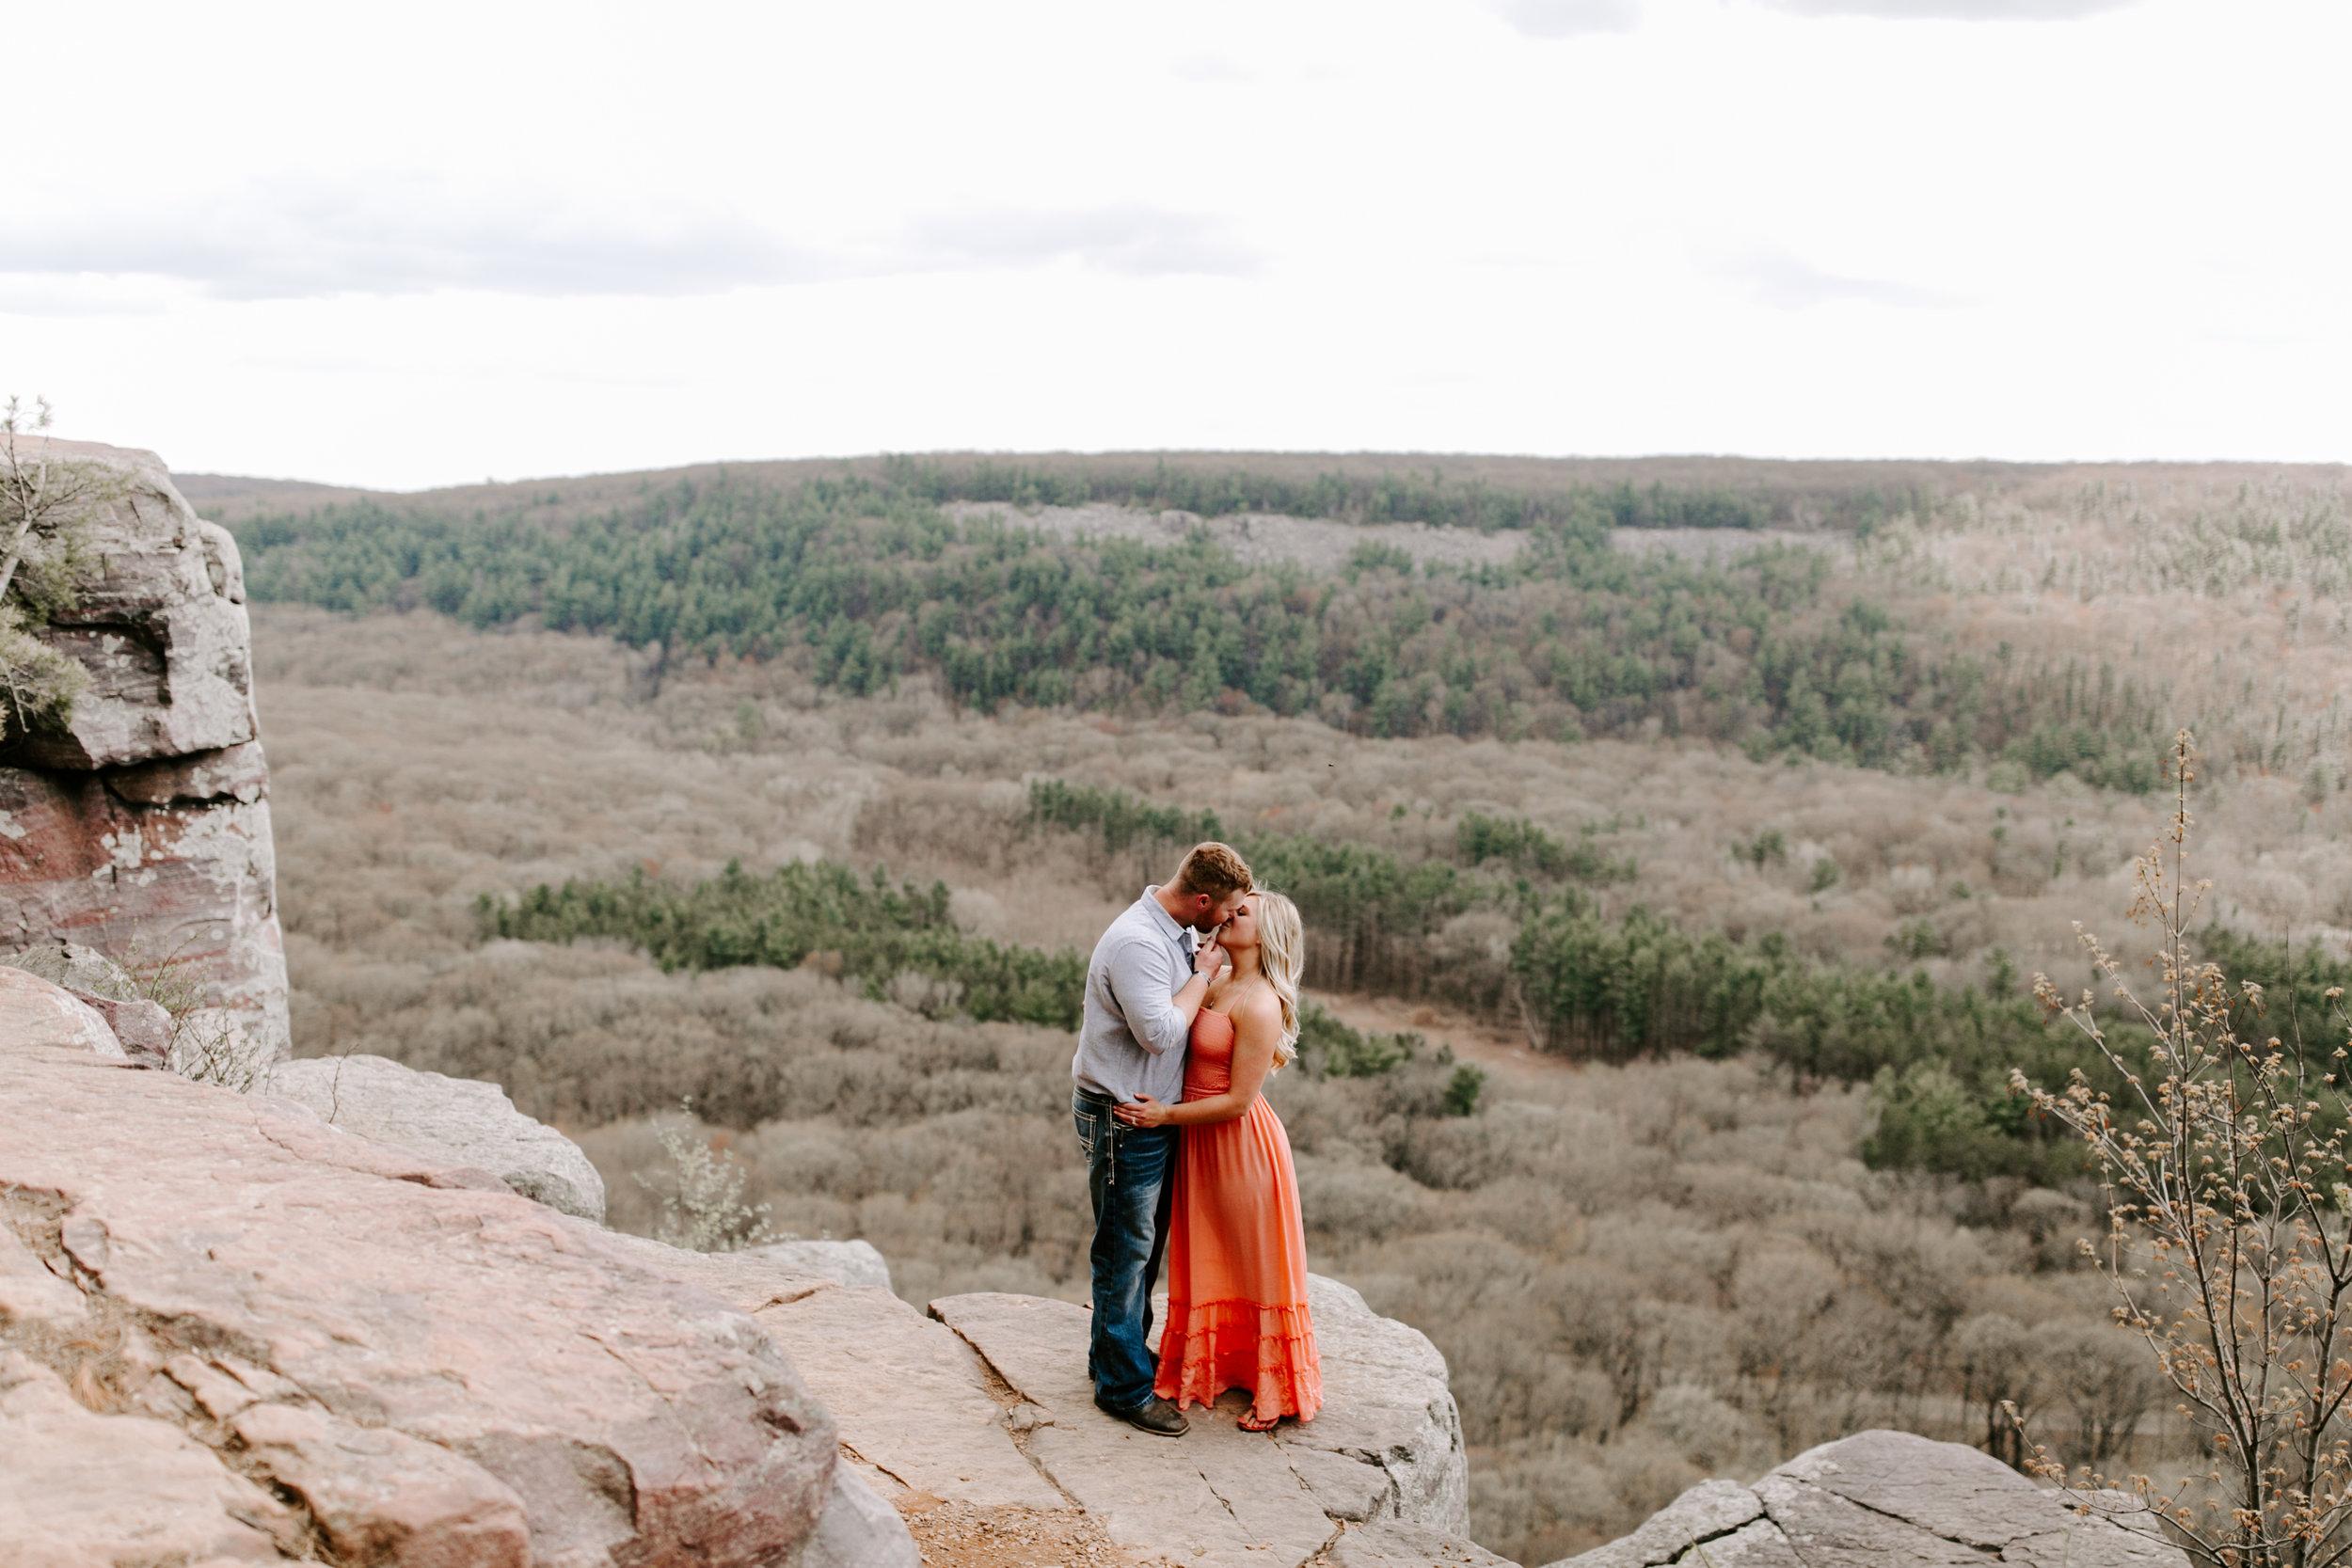 gracetphotography-wedding-photographer-adventure-bride-engagement-14.jpg